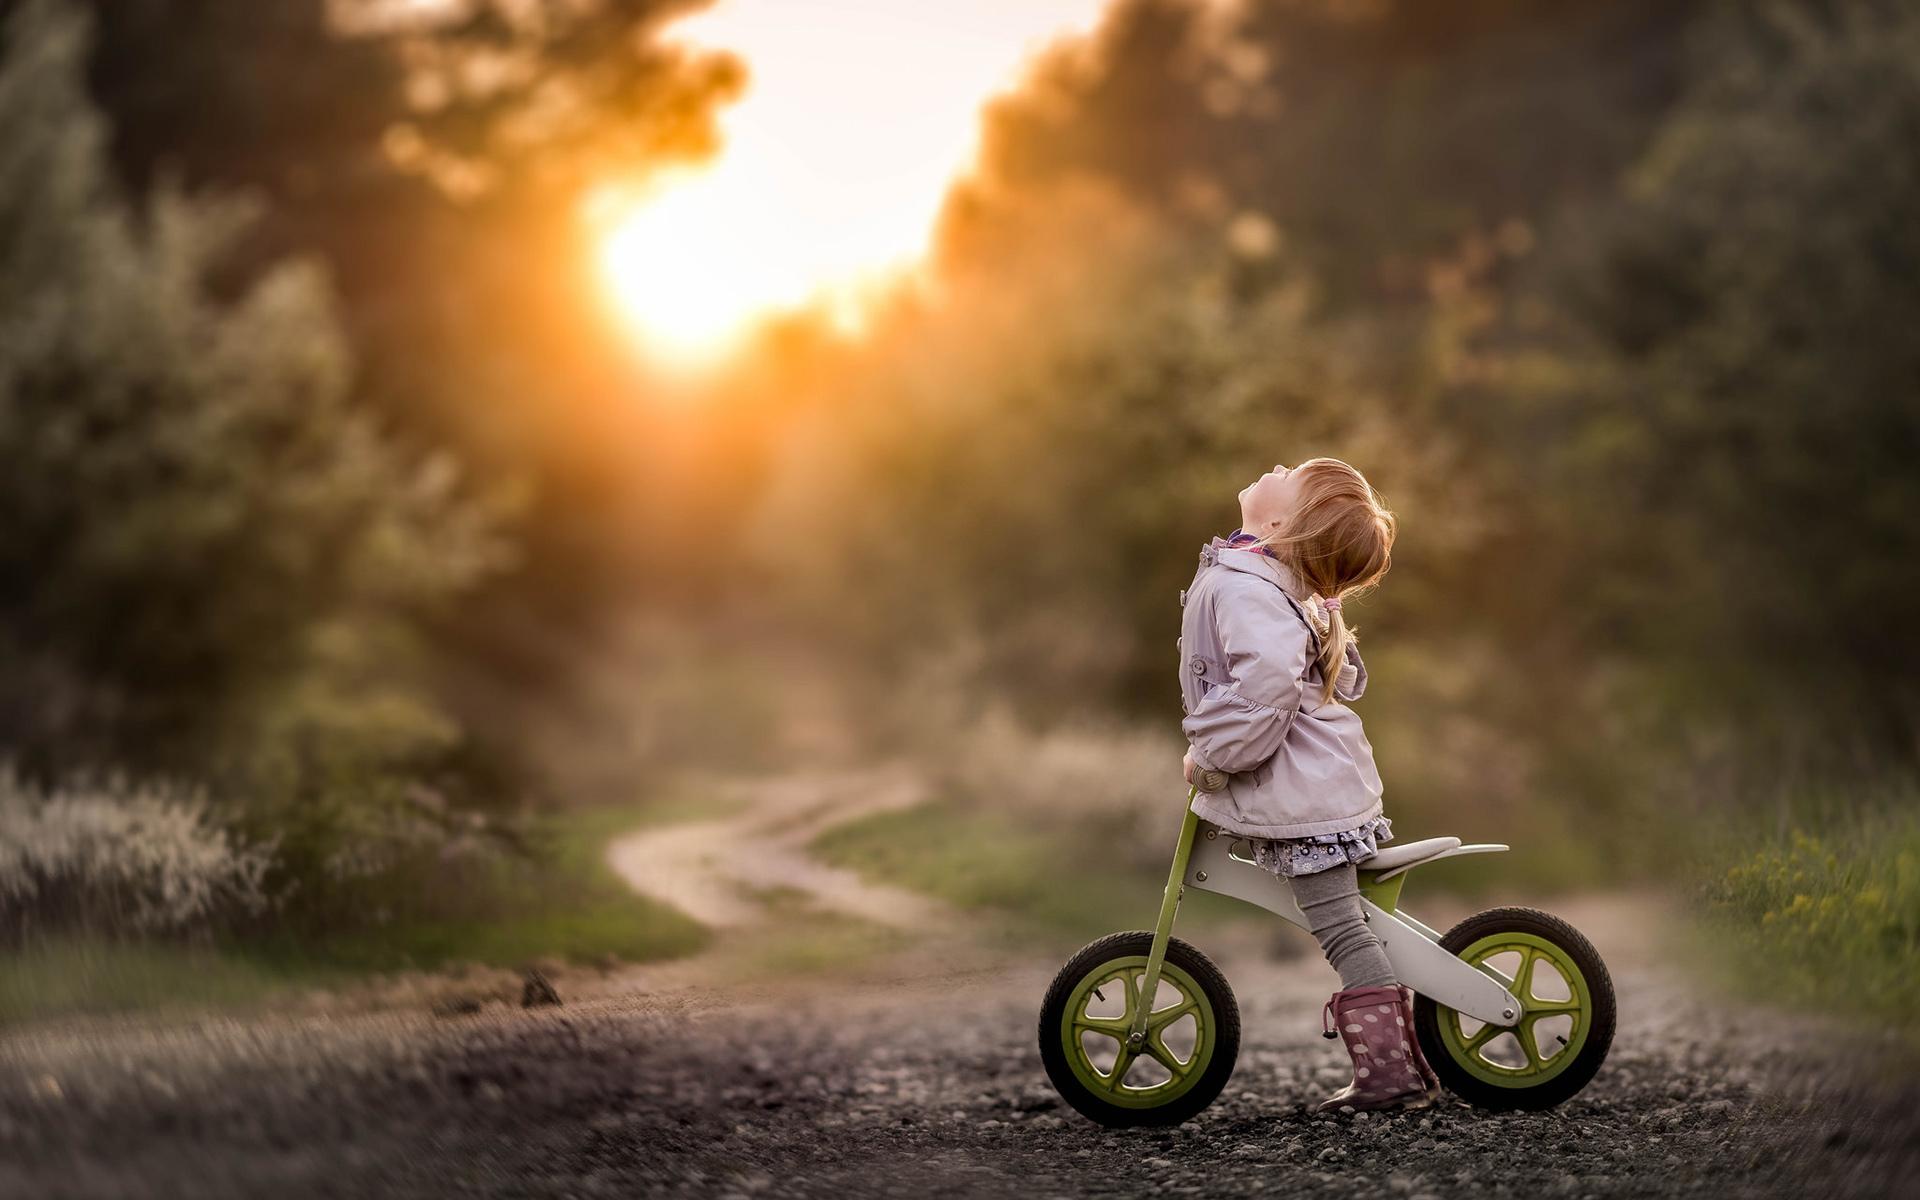 Image: Girl, walk, bike, summer, evening, sunset, road, footpath, trees, forest